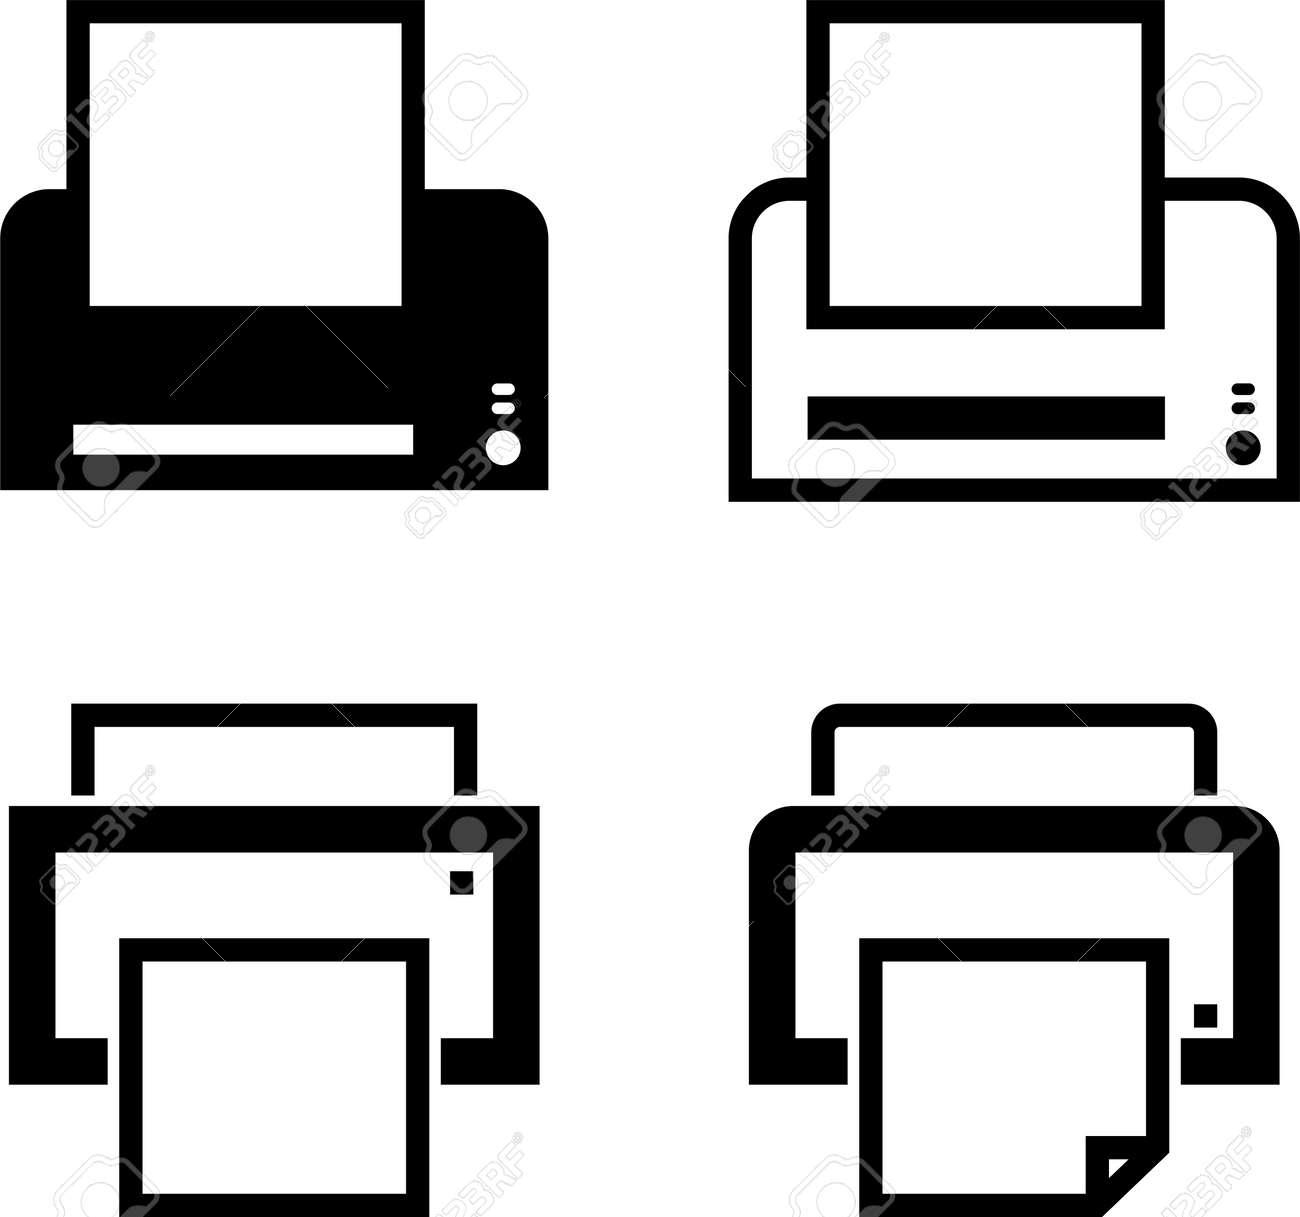 printer icon ink jet laser printer vector art illustration royalty free cliparts vectors and stock illustration image 97393842 123rf com